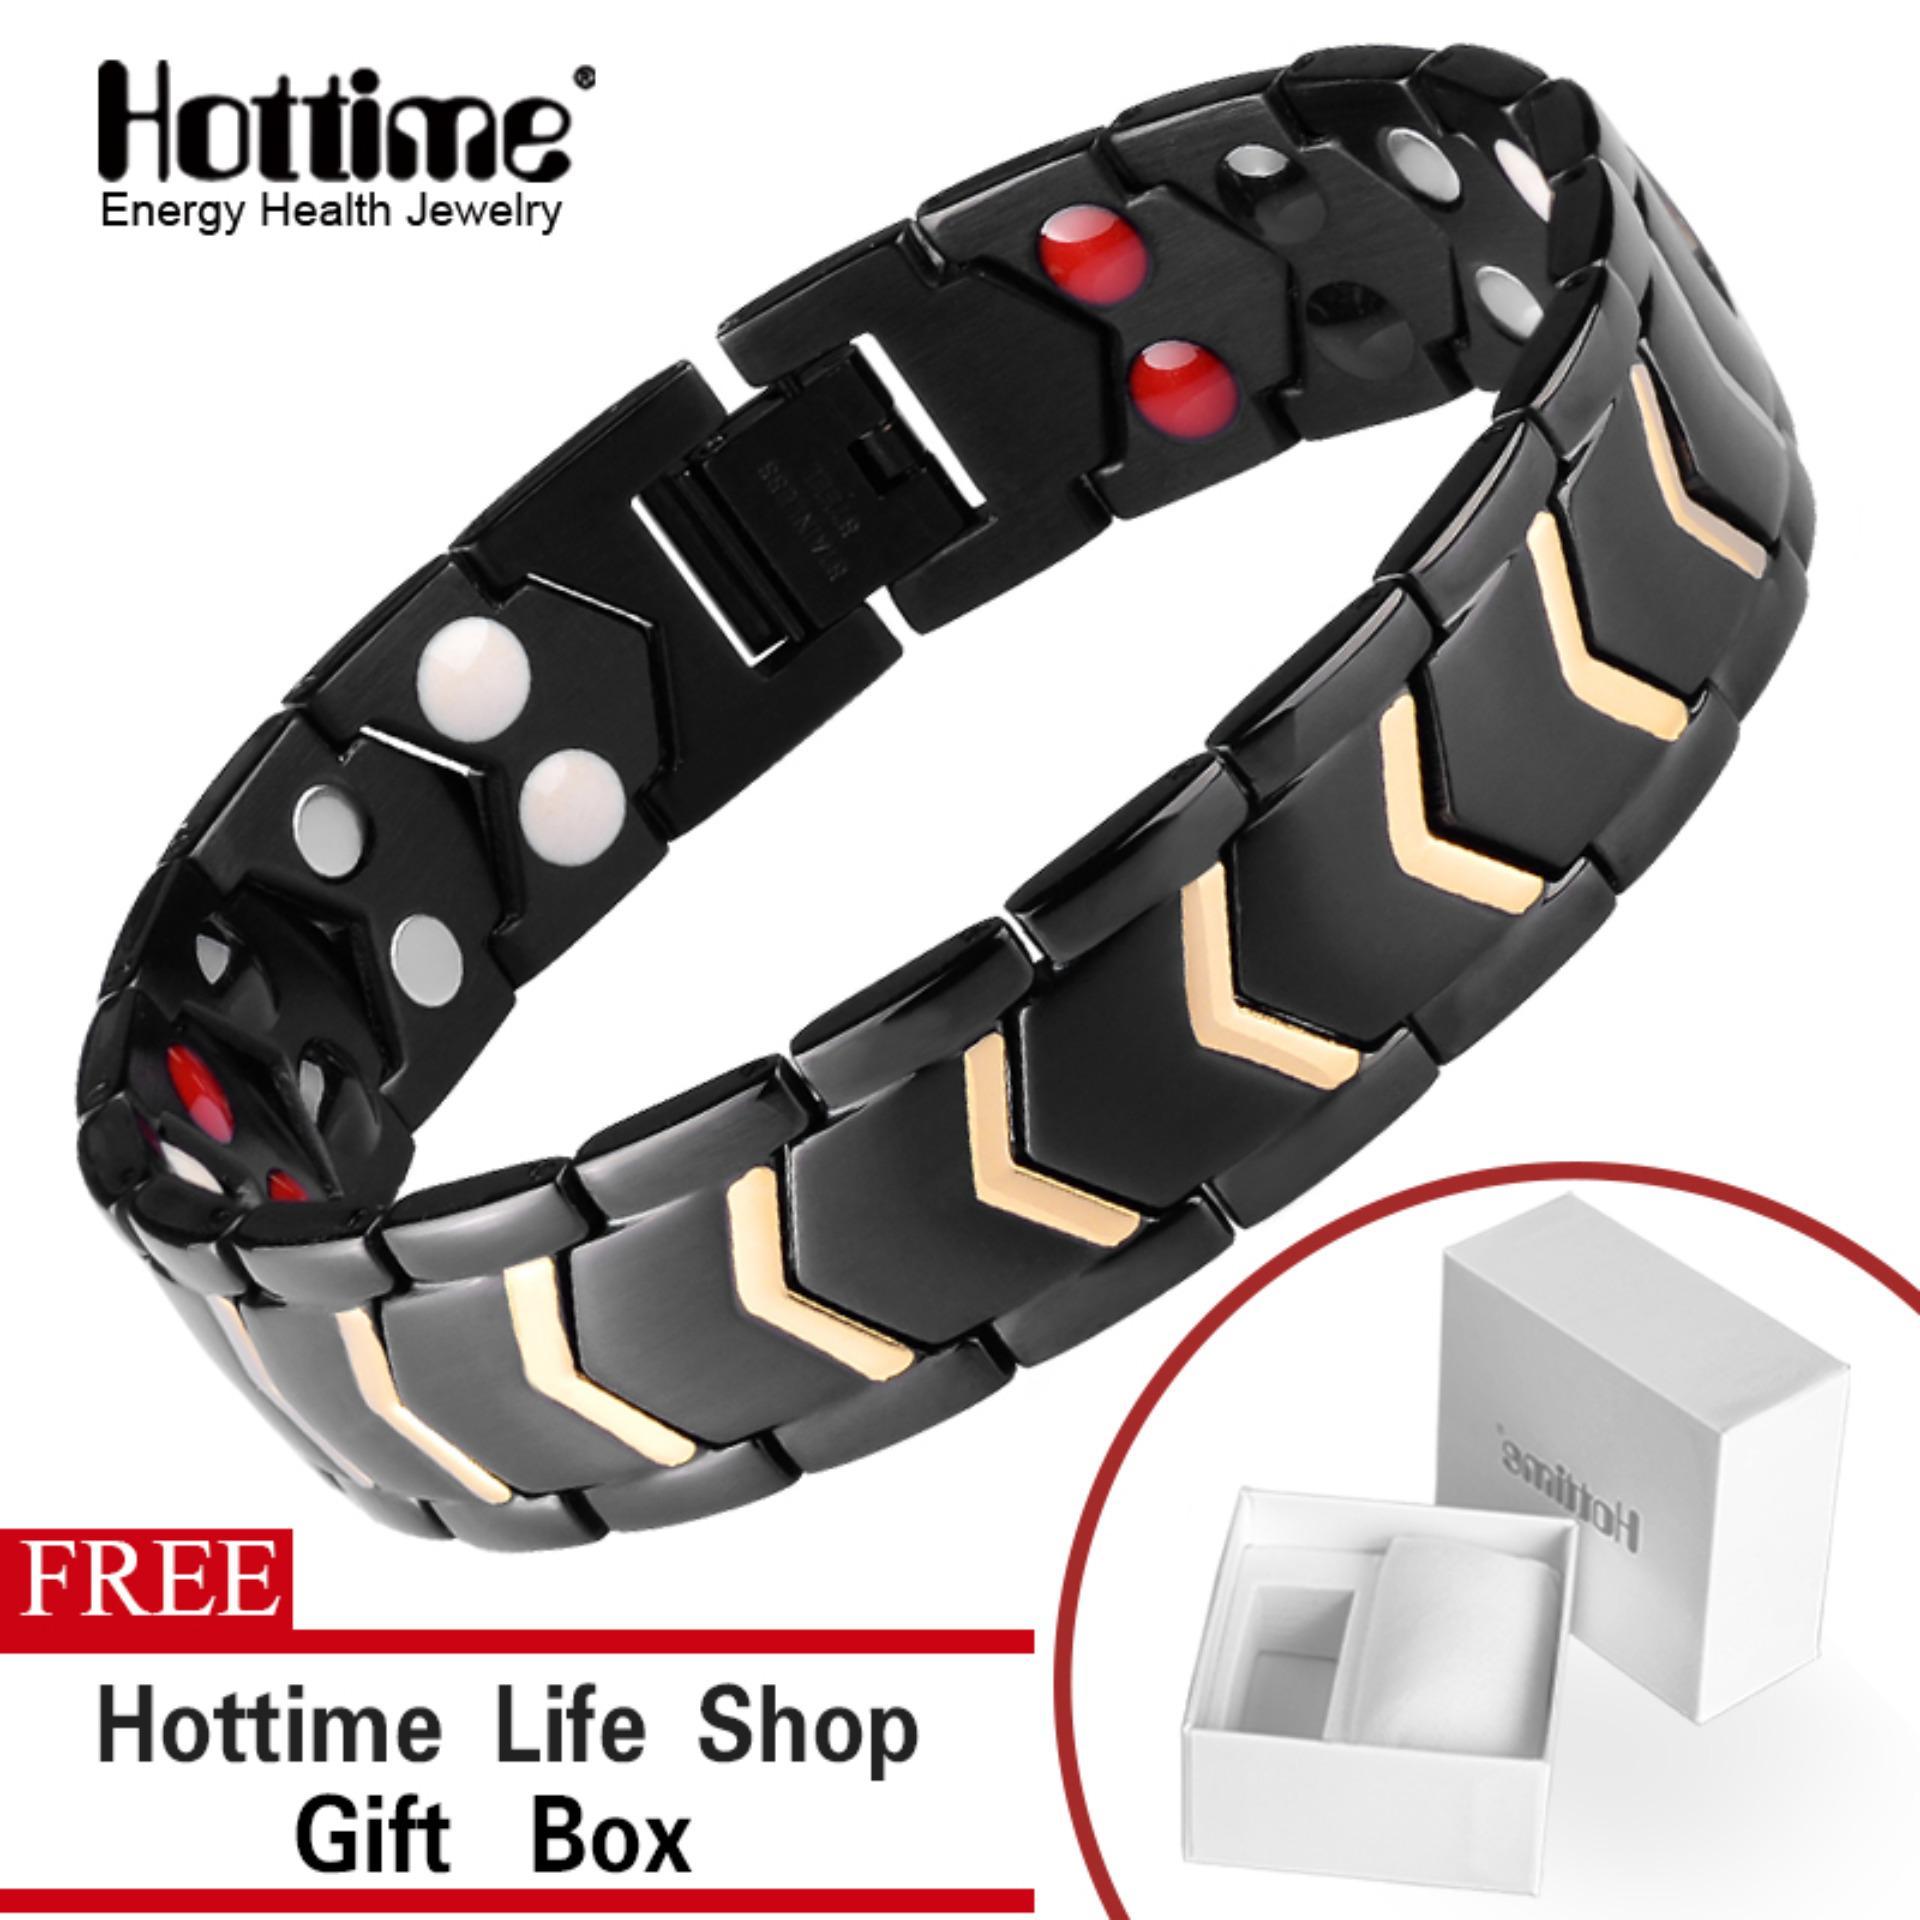 76e4c5c9c Hottime Luxury Double Row 4 Elements 316L Stainless Steel Magnetic Tharepy  Health Bracelet Bangle Link Wrist